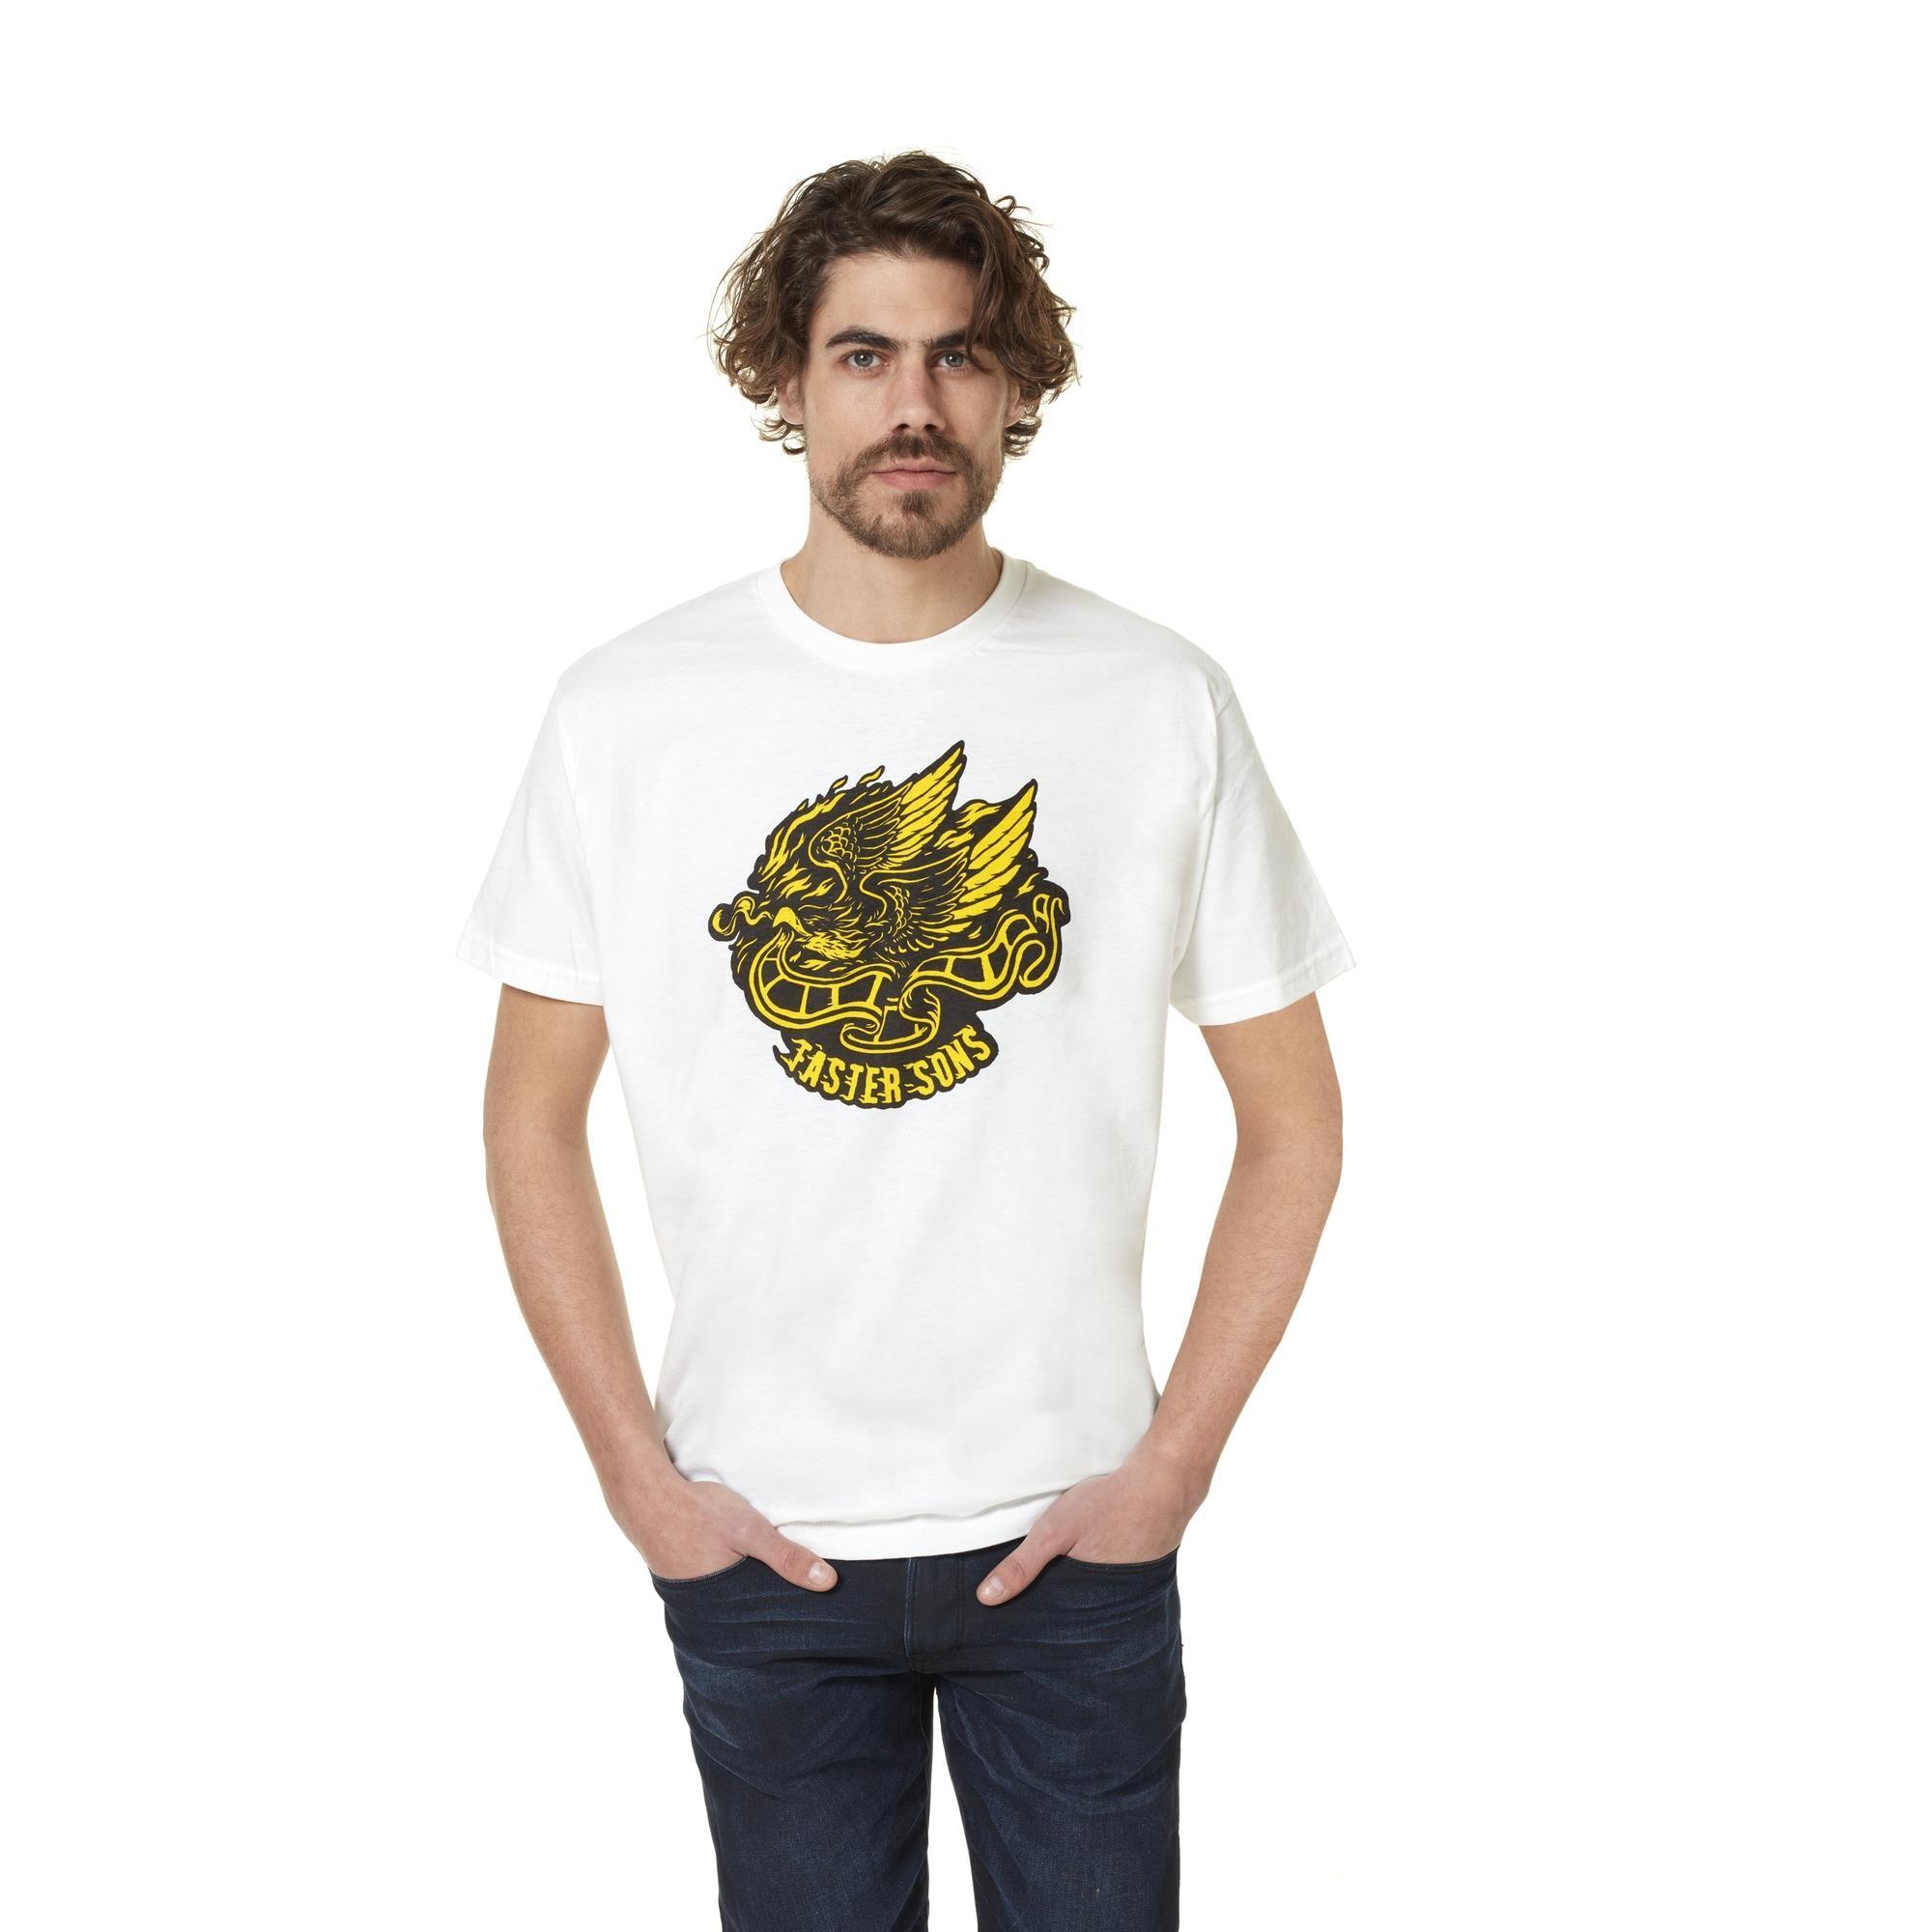 Camiseta Faster Sons de Roland Sands